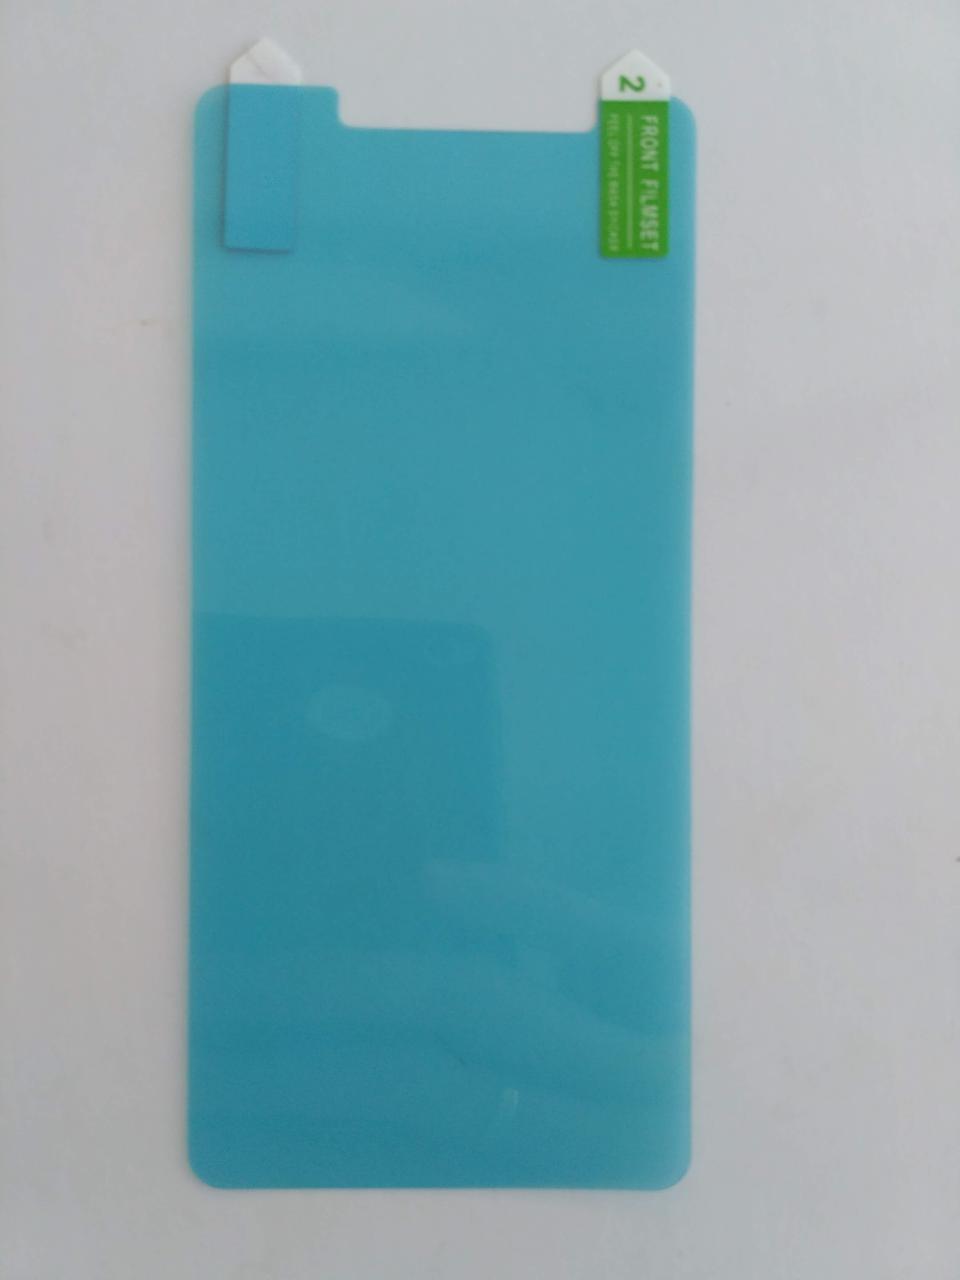 Пленка для Xiaomi Redmi Note 5 / 5 Pro глянцевая ударопрочная